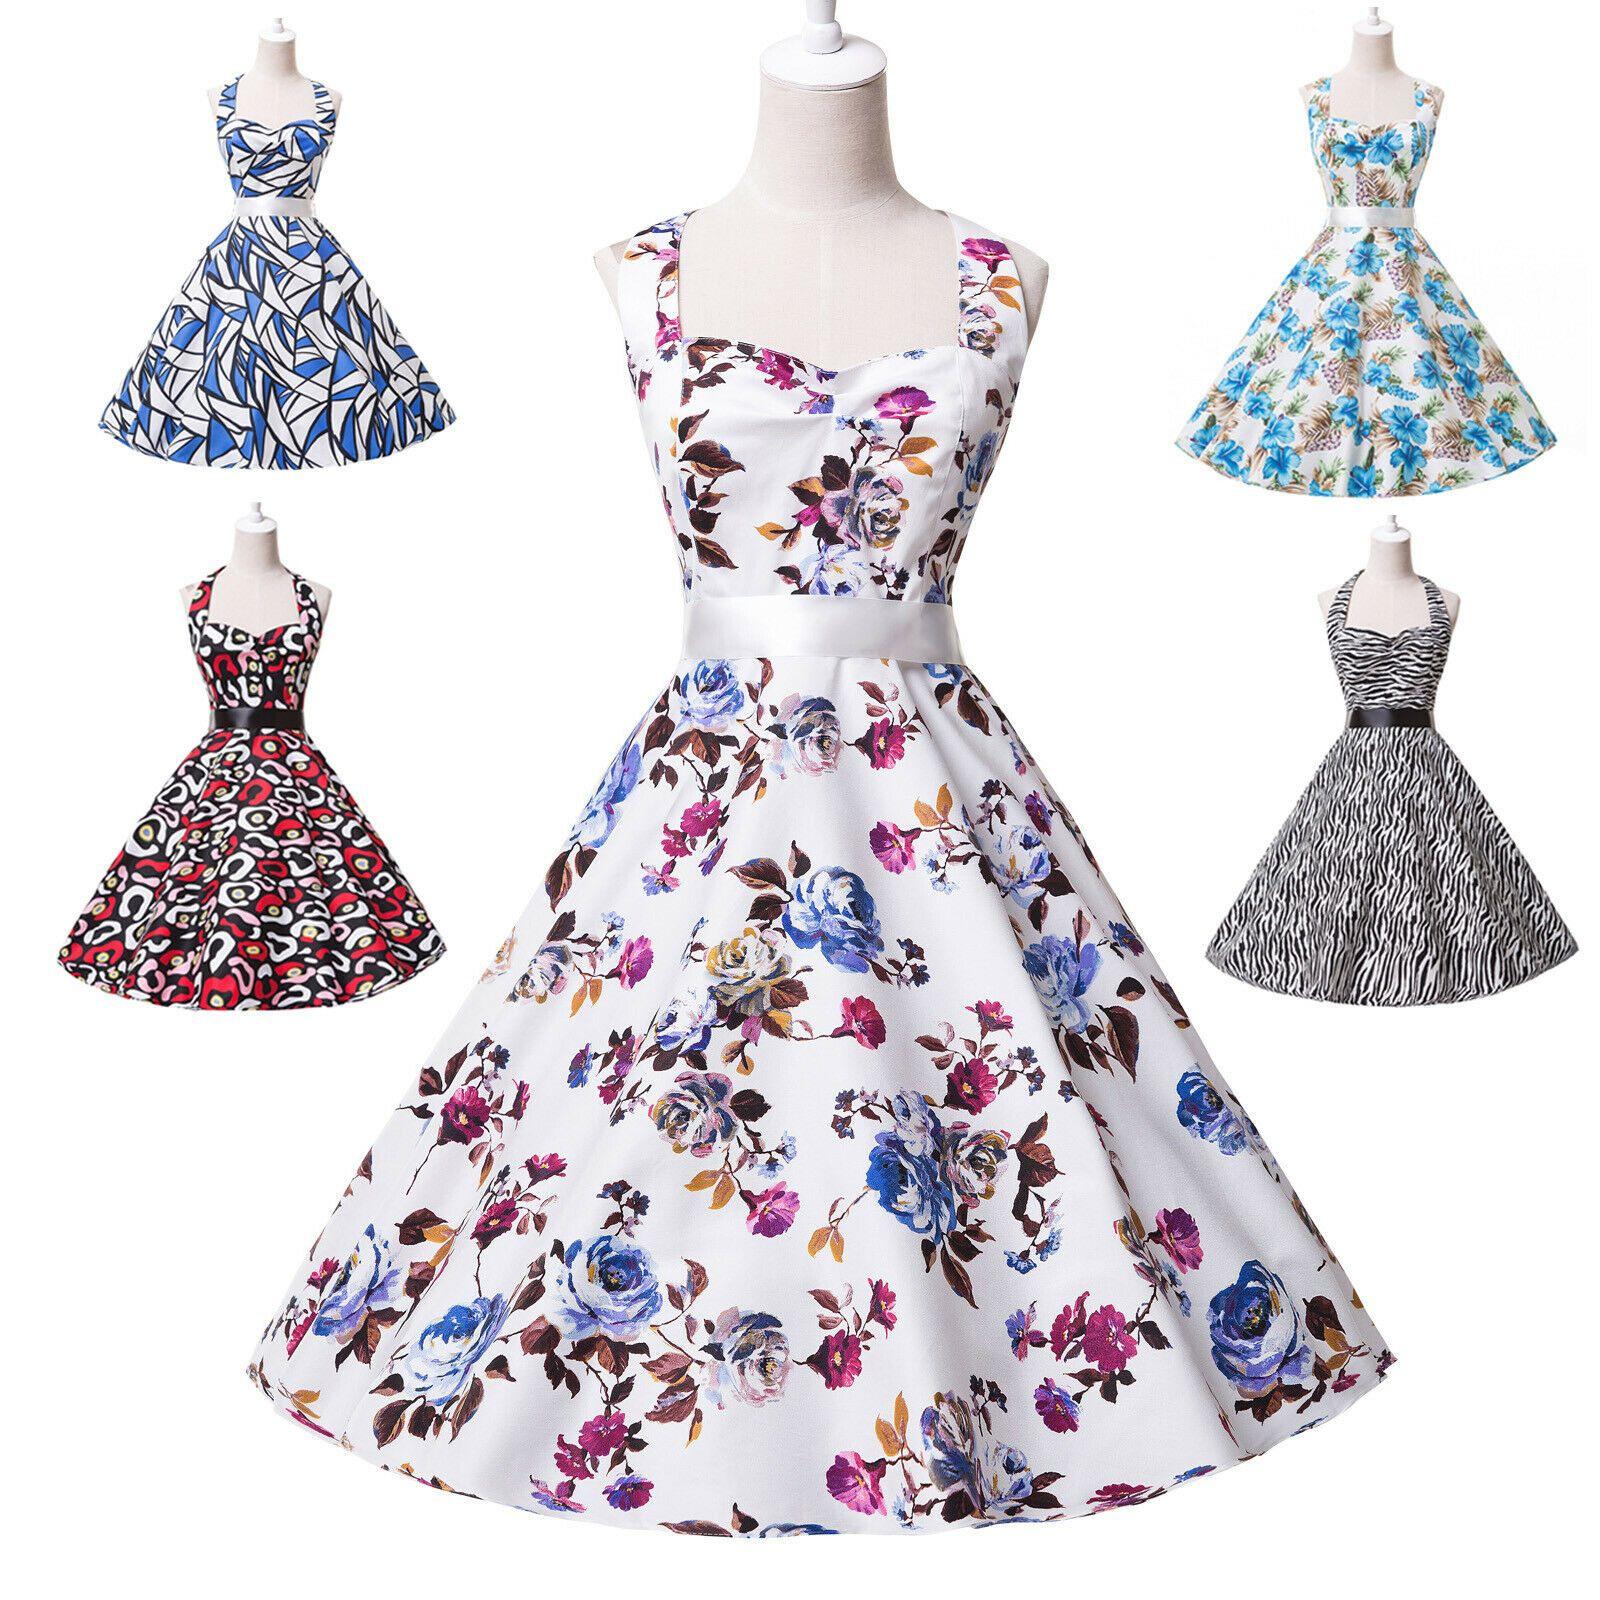 20 Genial Abend Petticoat Kleid BoutiqueAbend Luxurius Abend Petticoat Kleid Vertrieb